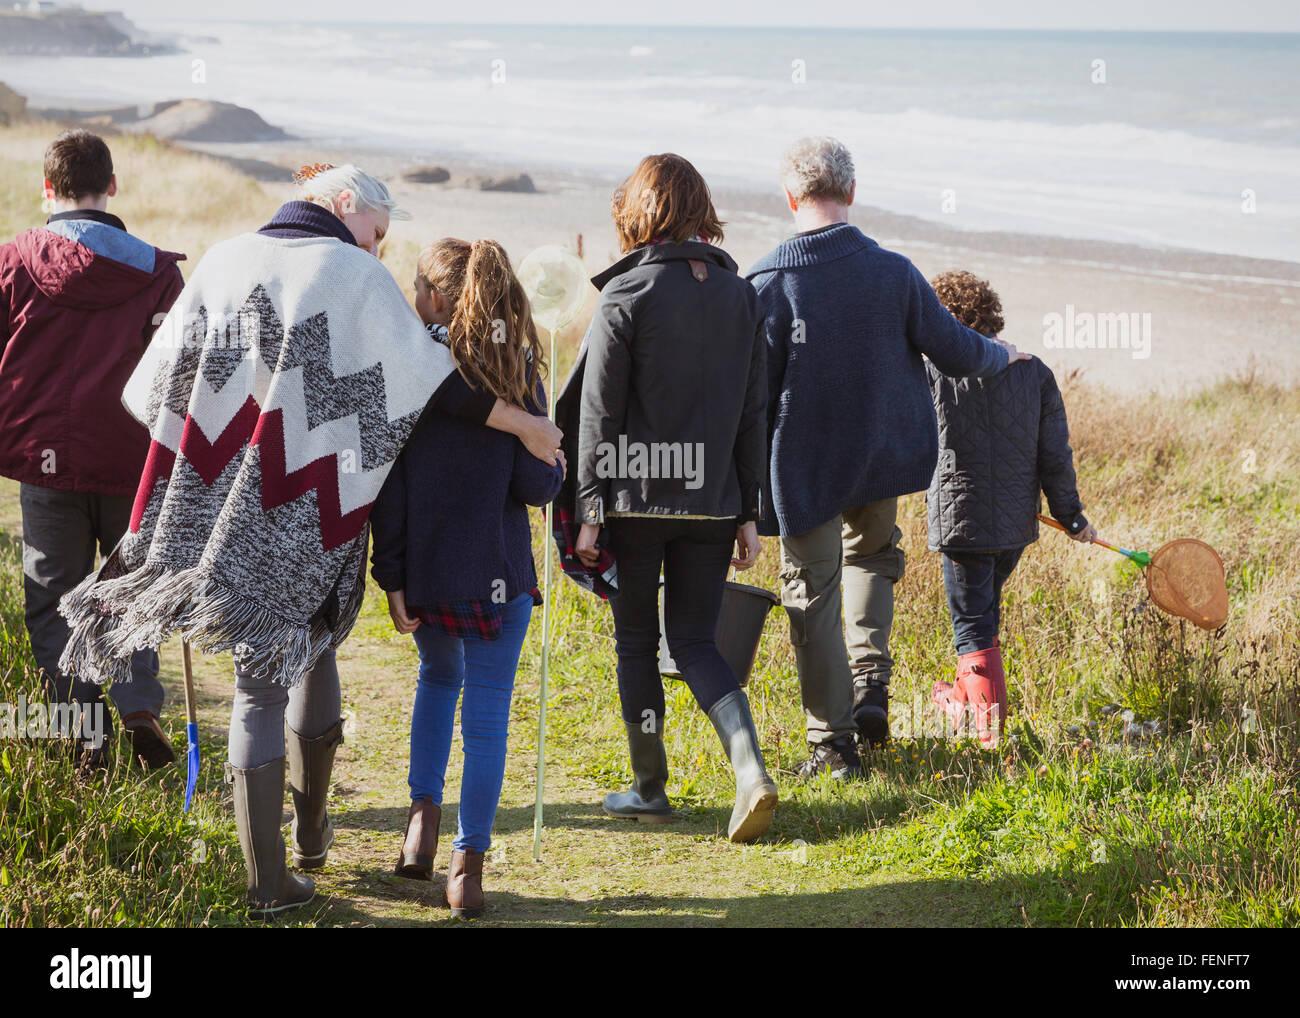 Multi-generation family walking on sunny beach grass path Photo Stock